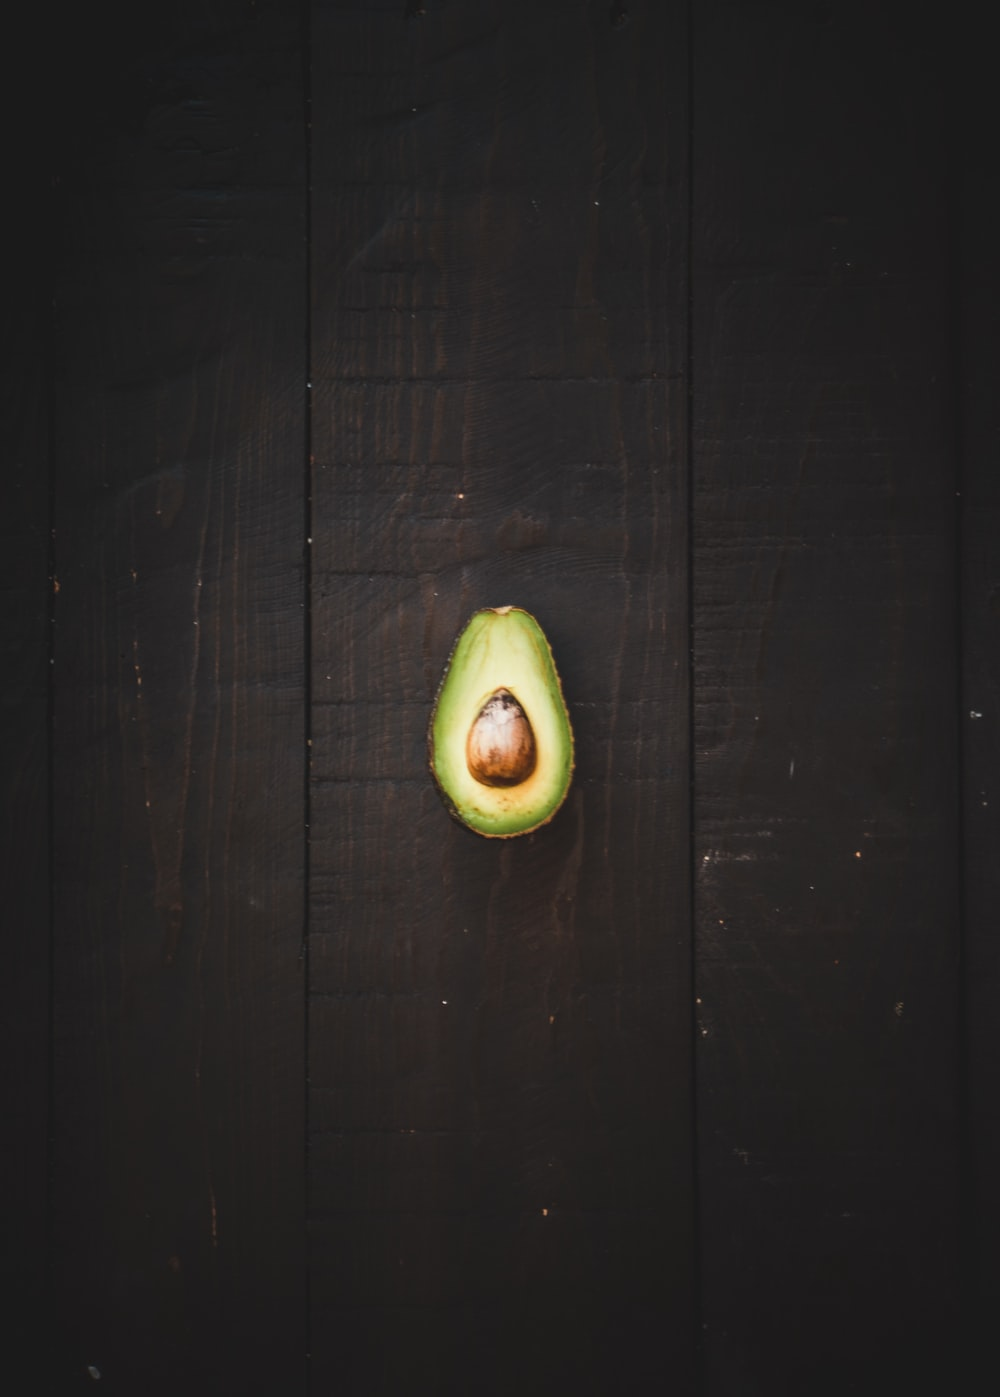 sliced green avocado